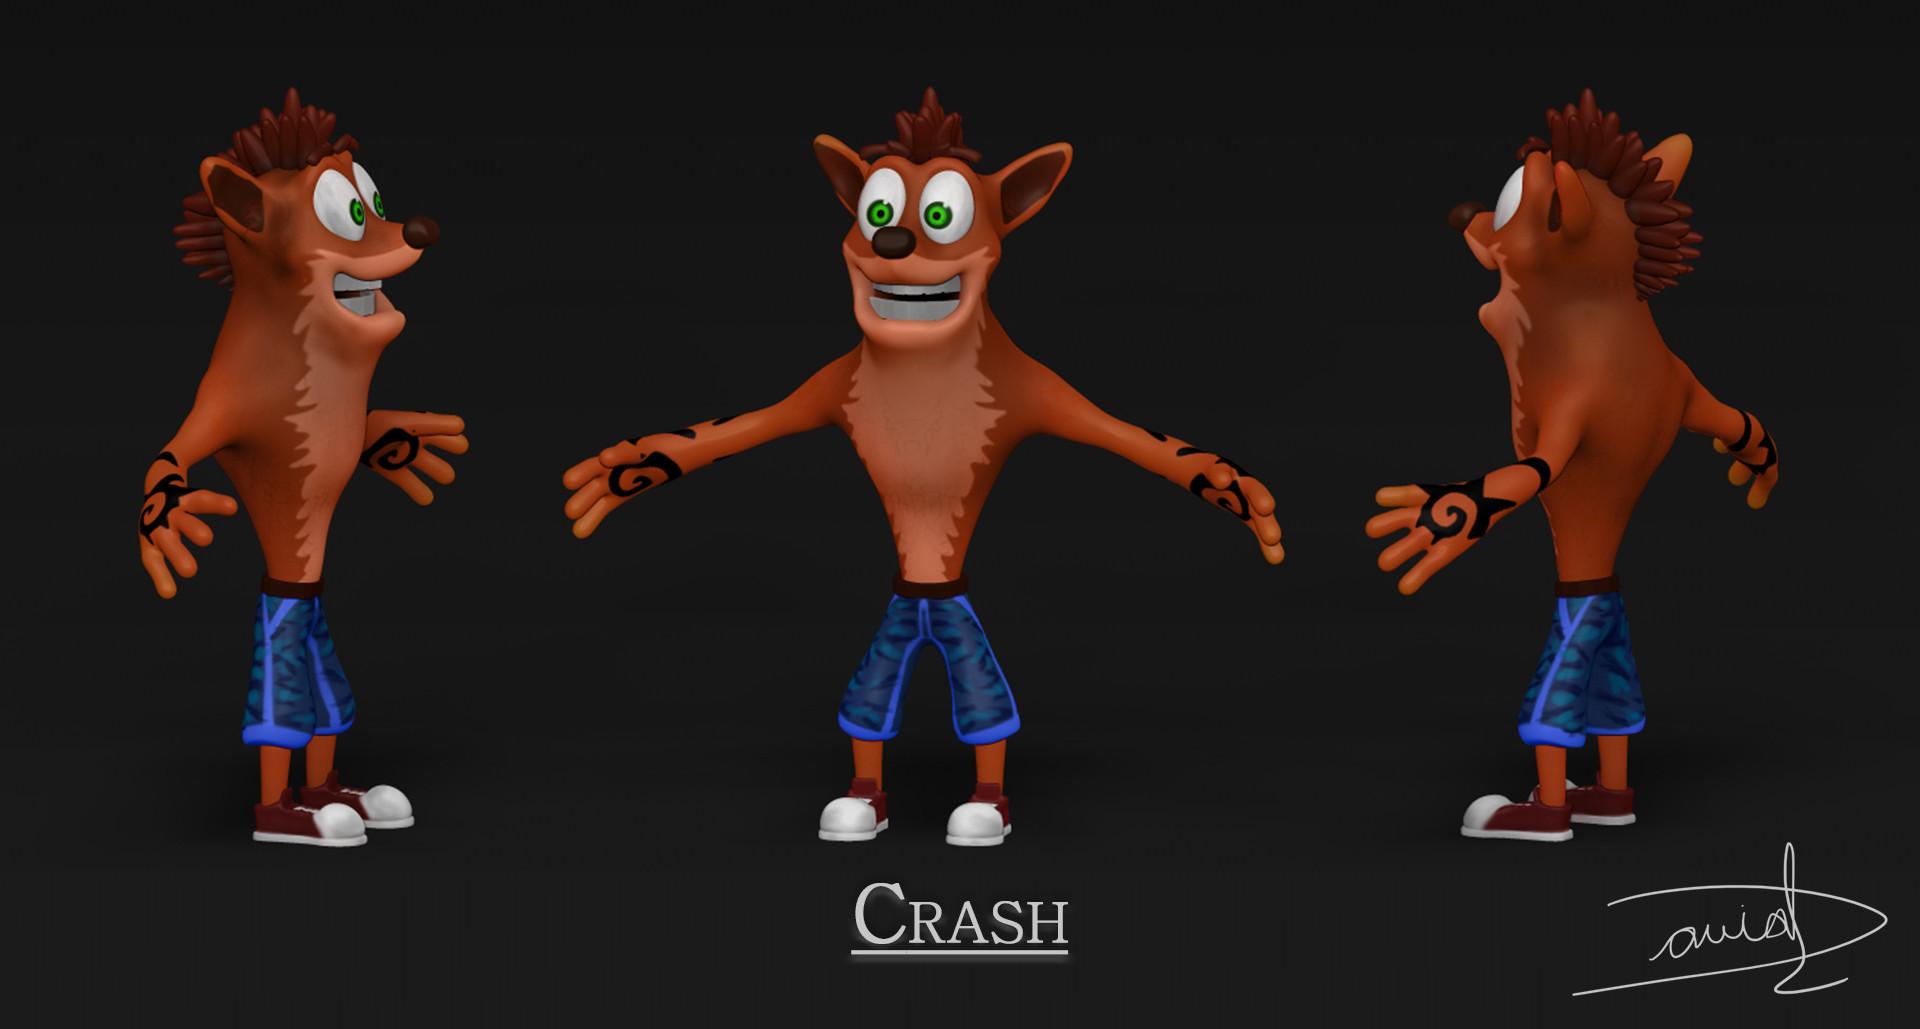 Artstation Crash Bandicoot Concept Art David Chaparro Romero